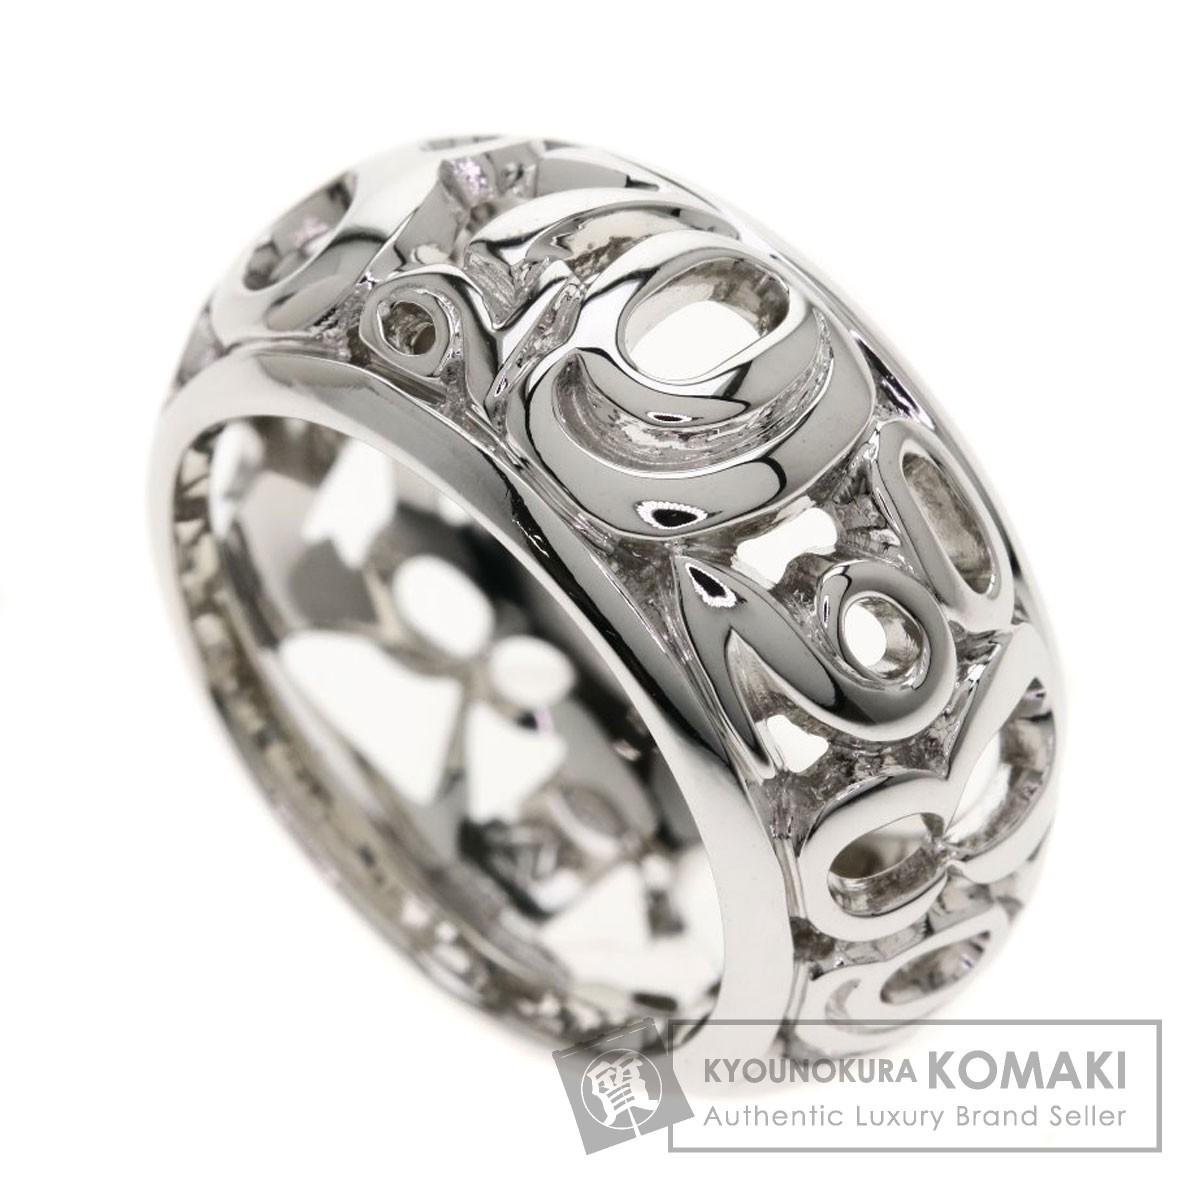 FRANCK MULLER タリスマン リング・指輪 K18ホワイトゴールド レディース 【中古】【フランクミュラー】